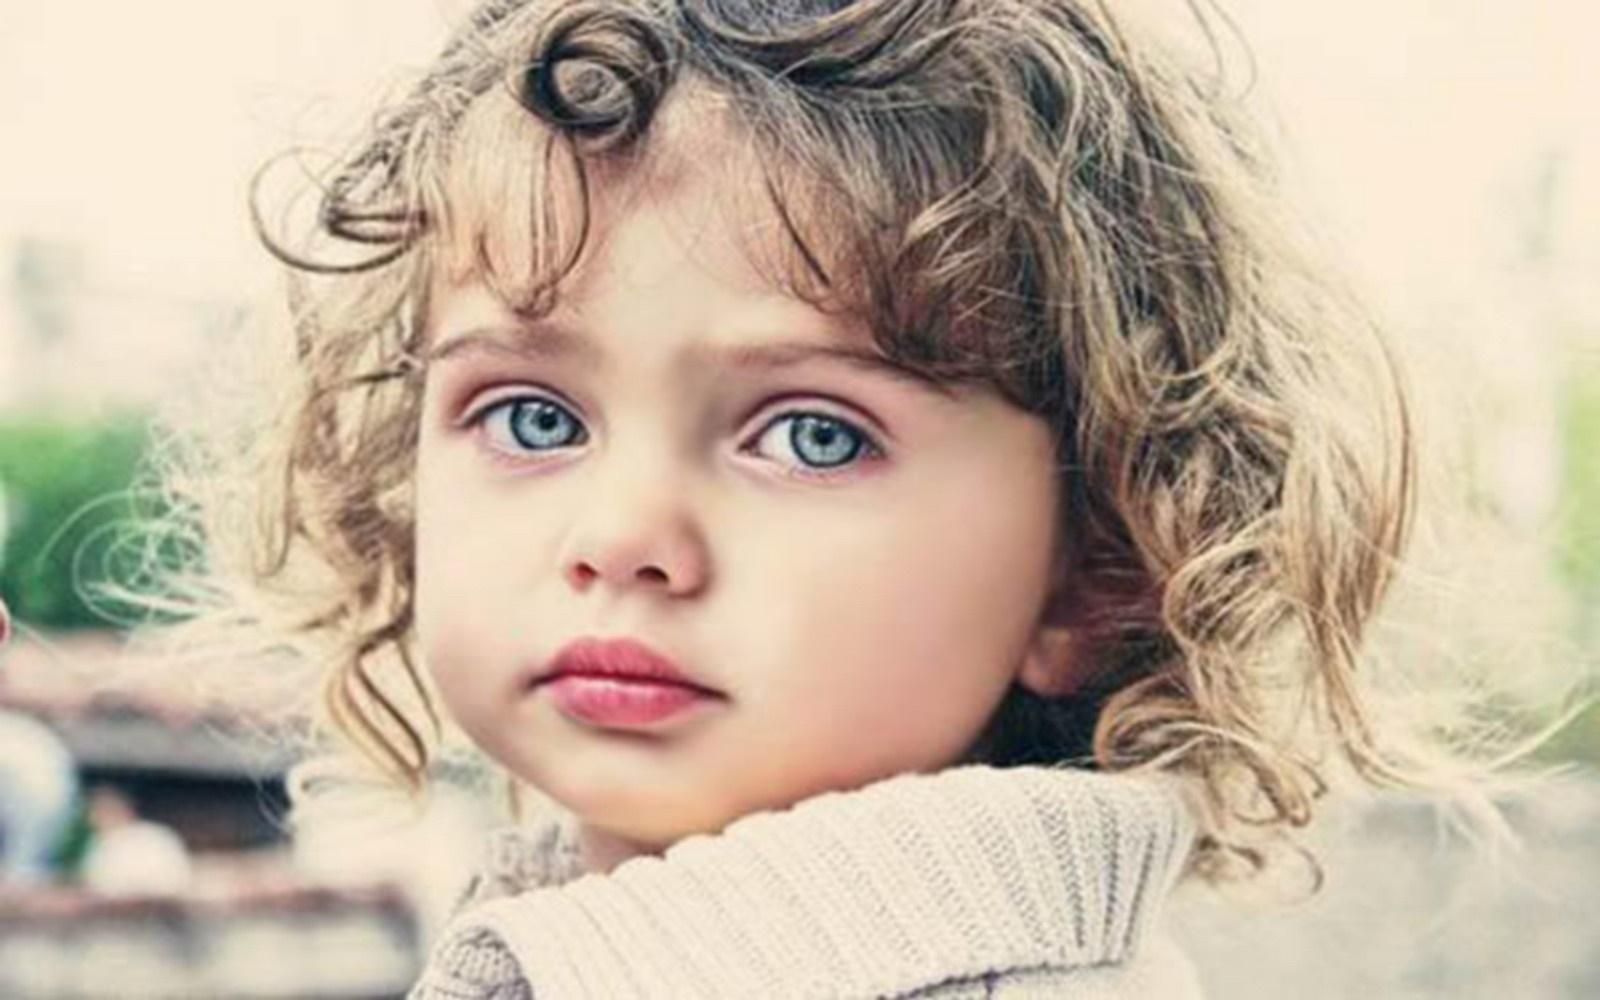 بالصور فتيات جميلات , صور بنات اطفال يجننوا 4374 11